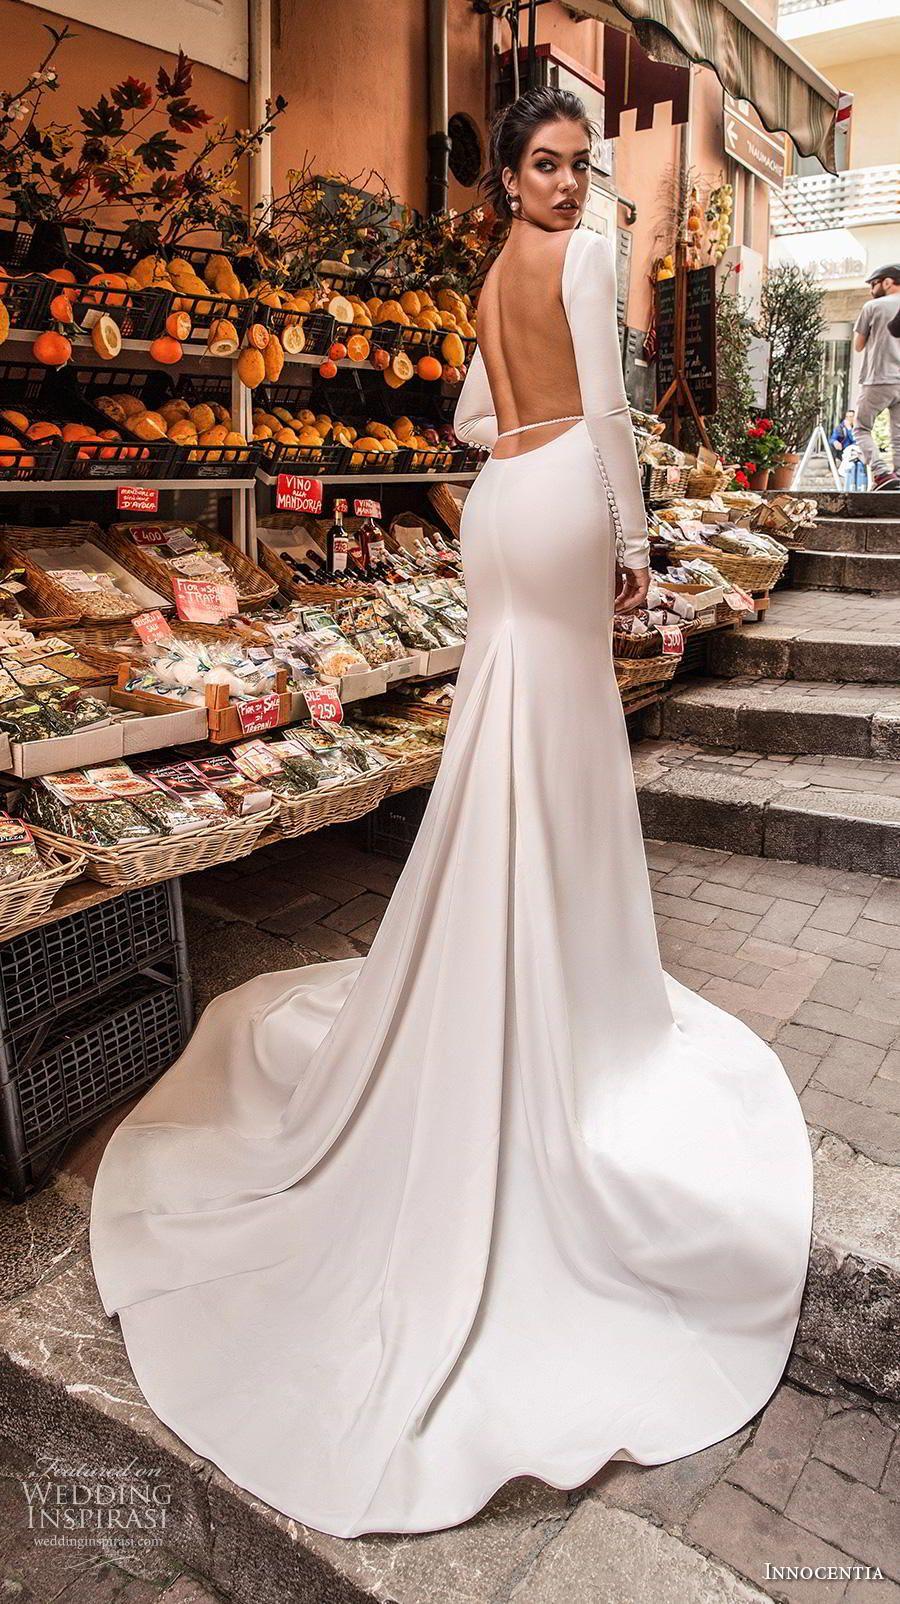 Innocentia 2019 Wedding Dresses Taormina Bridal Collection Wedding Inspirasi Wedding Dress Low Back Wedding Dresses Backless Wedding Dress [ 1604 x 900 Pixel ]